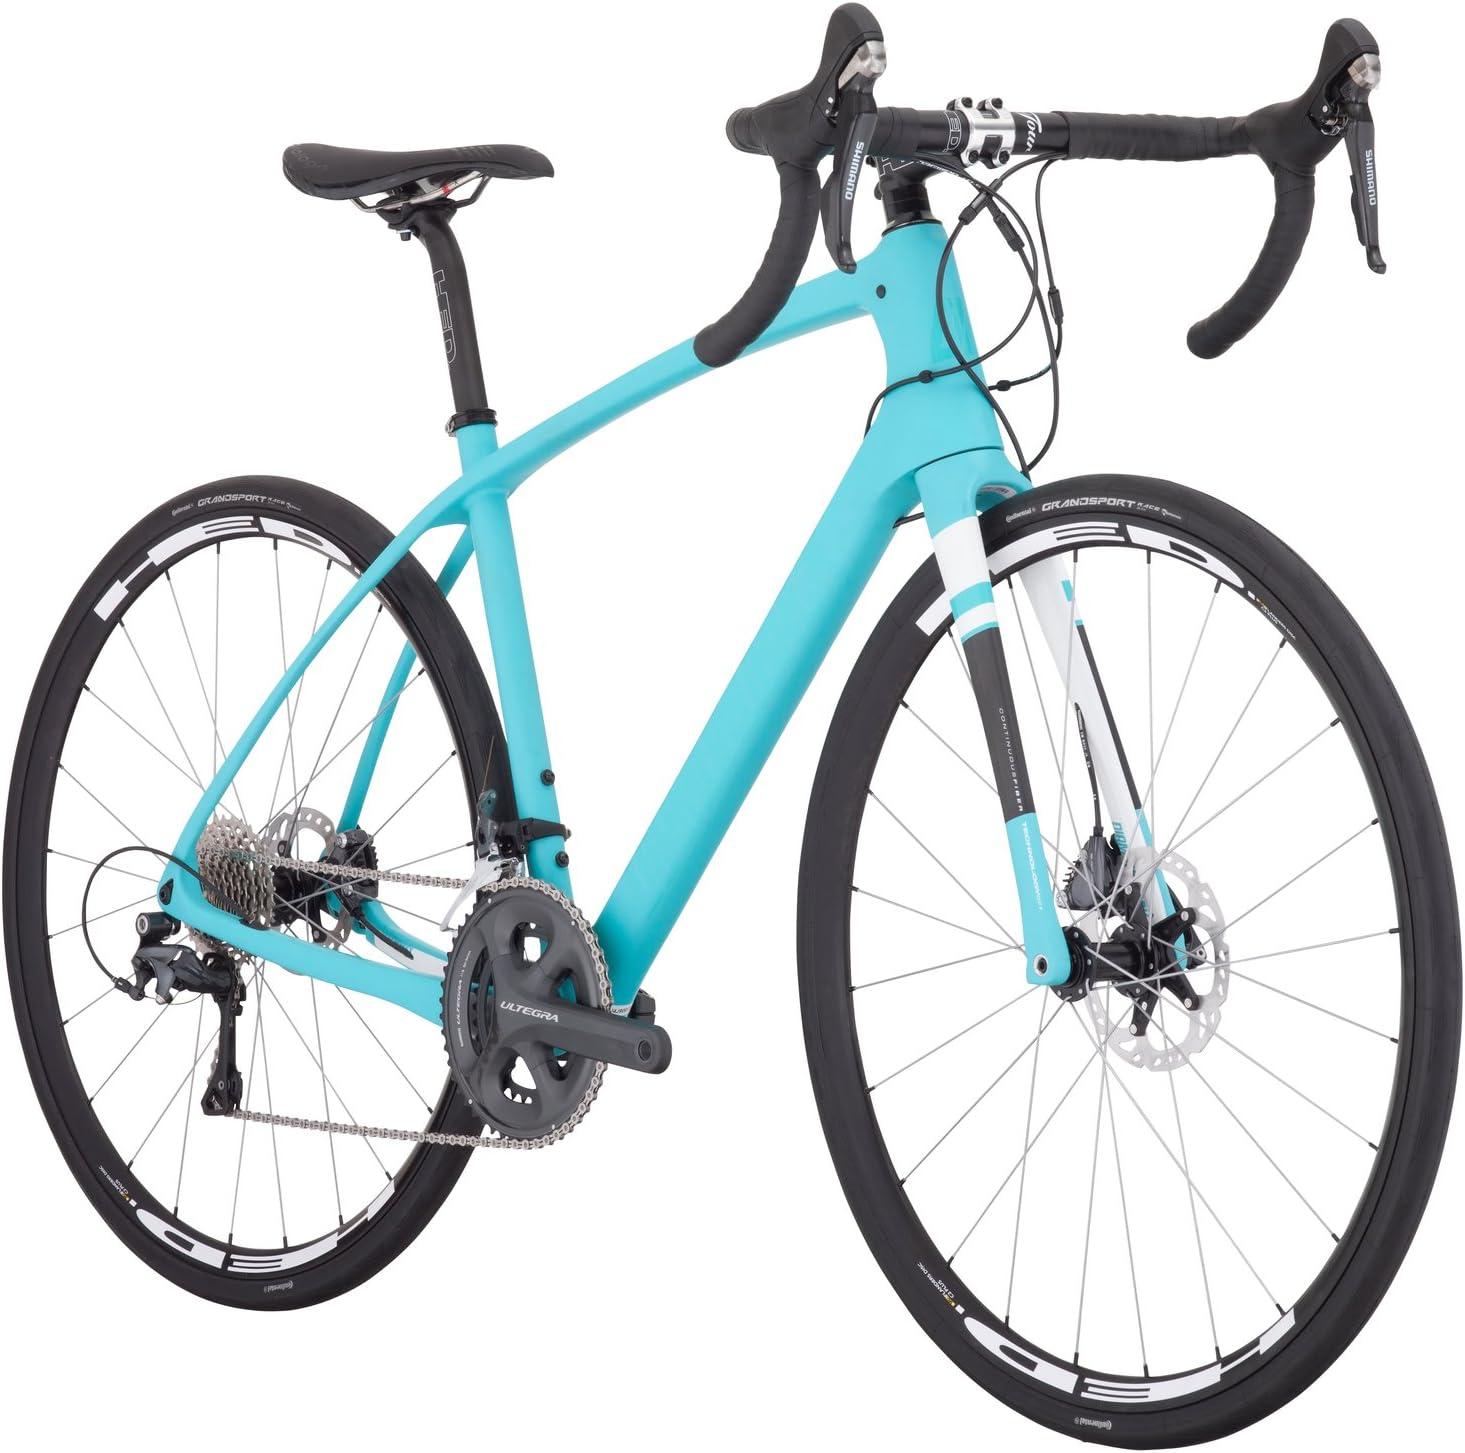 Diamondback Bicycles Airen 5 Bicicleta de Carretera de Carbono ...